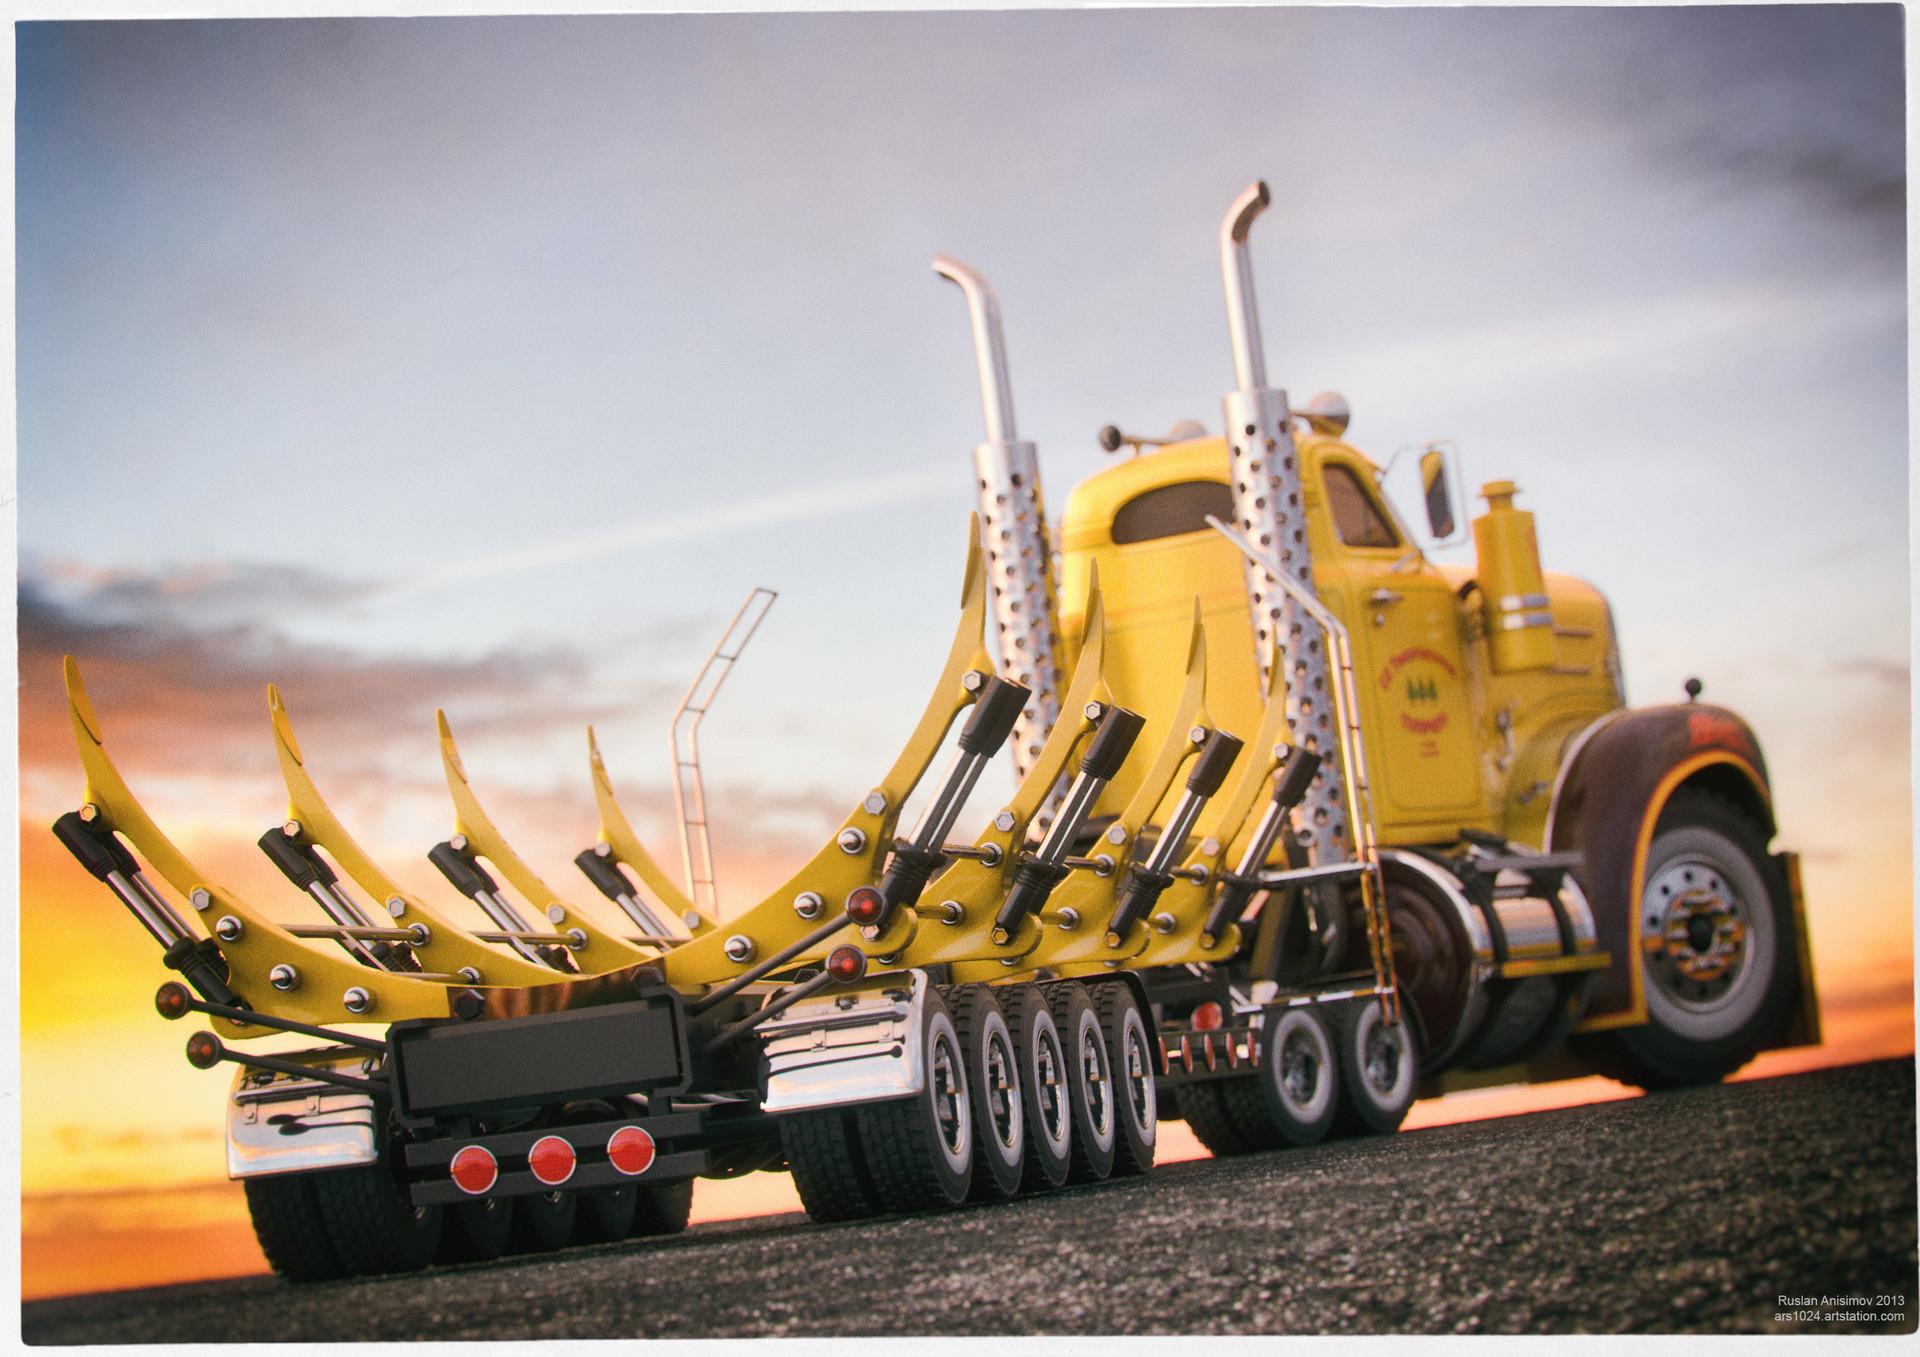 Ruslan anisimov 2013 truck08